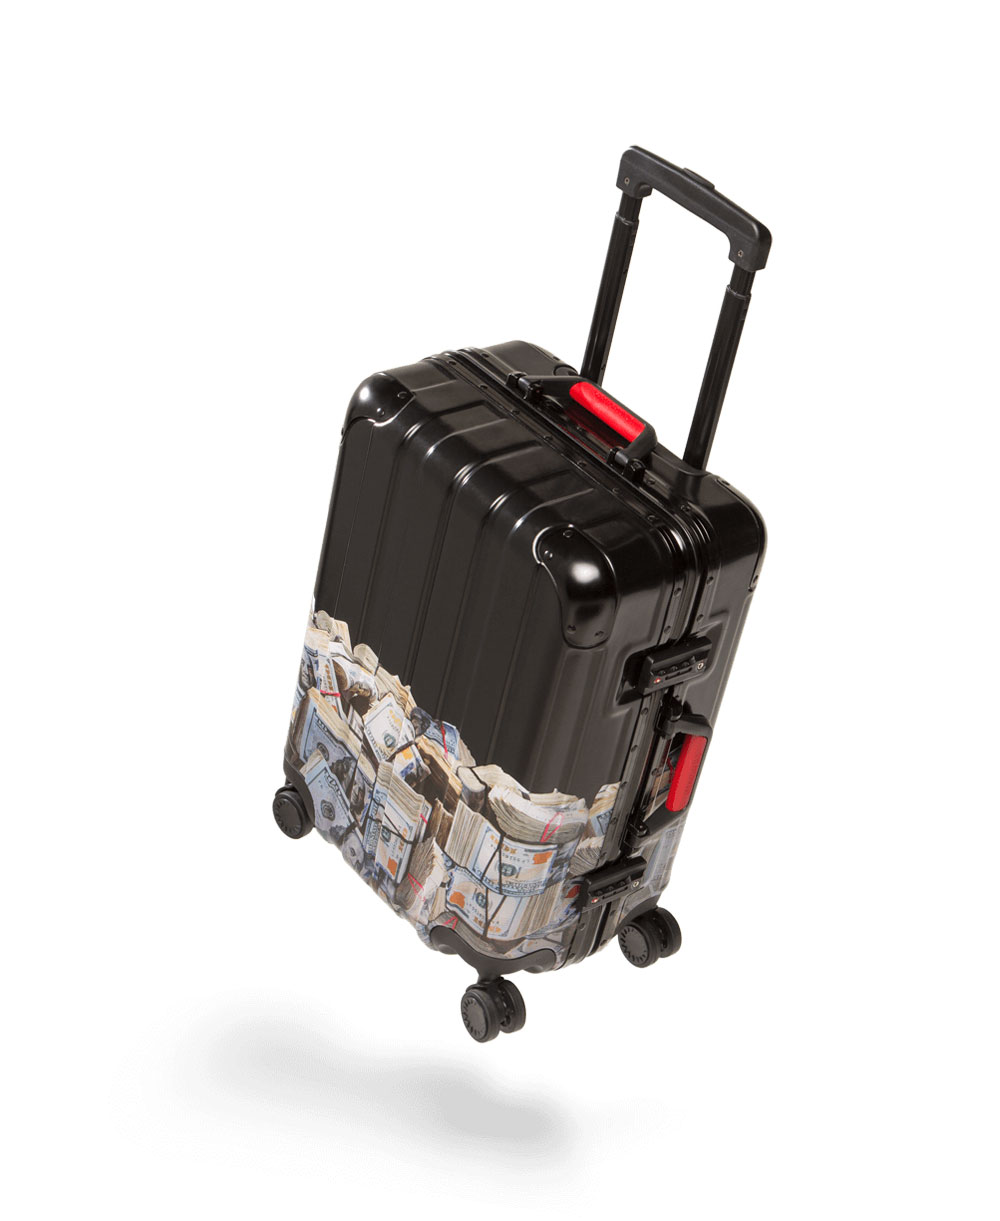 "Valigia Money Rolled 22"" Carry-On 4 Ruote con Lucchetto TSA"